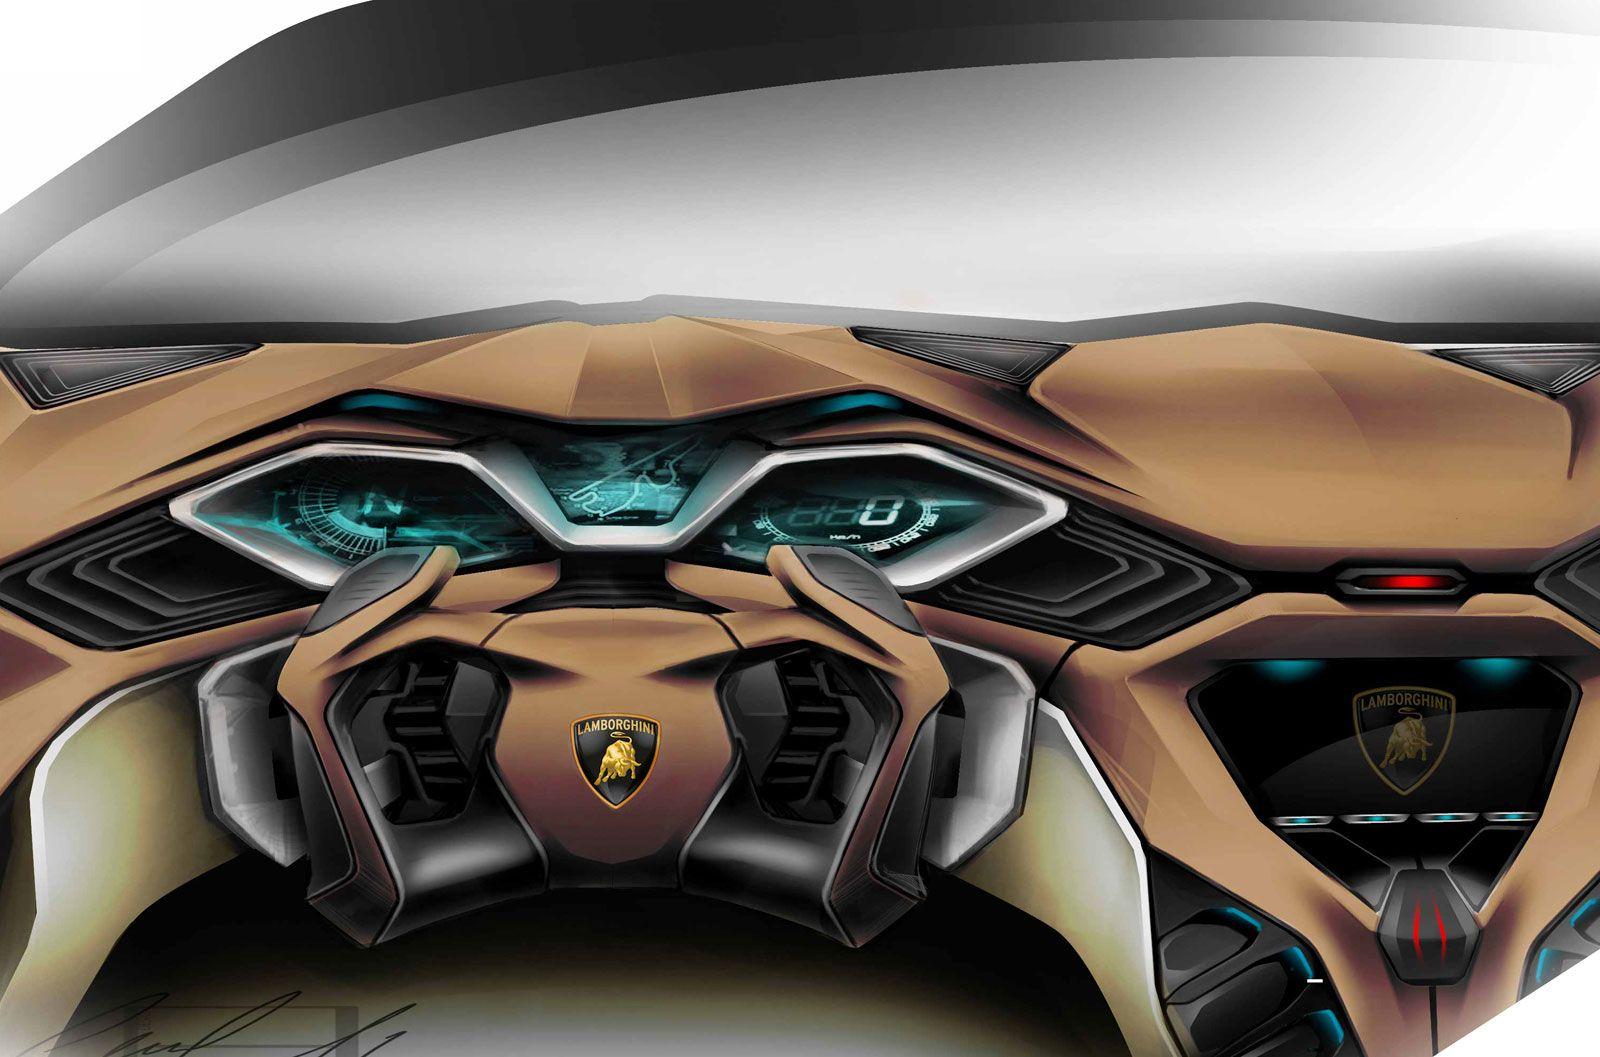 Spd Lamborghini Concept Interior Design Sketch Sweet Lambo